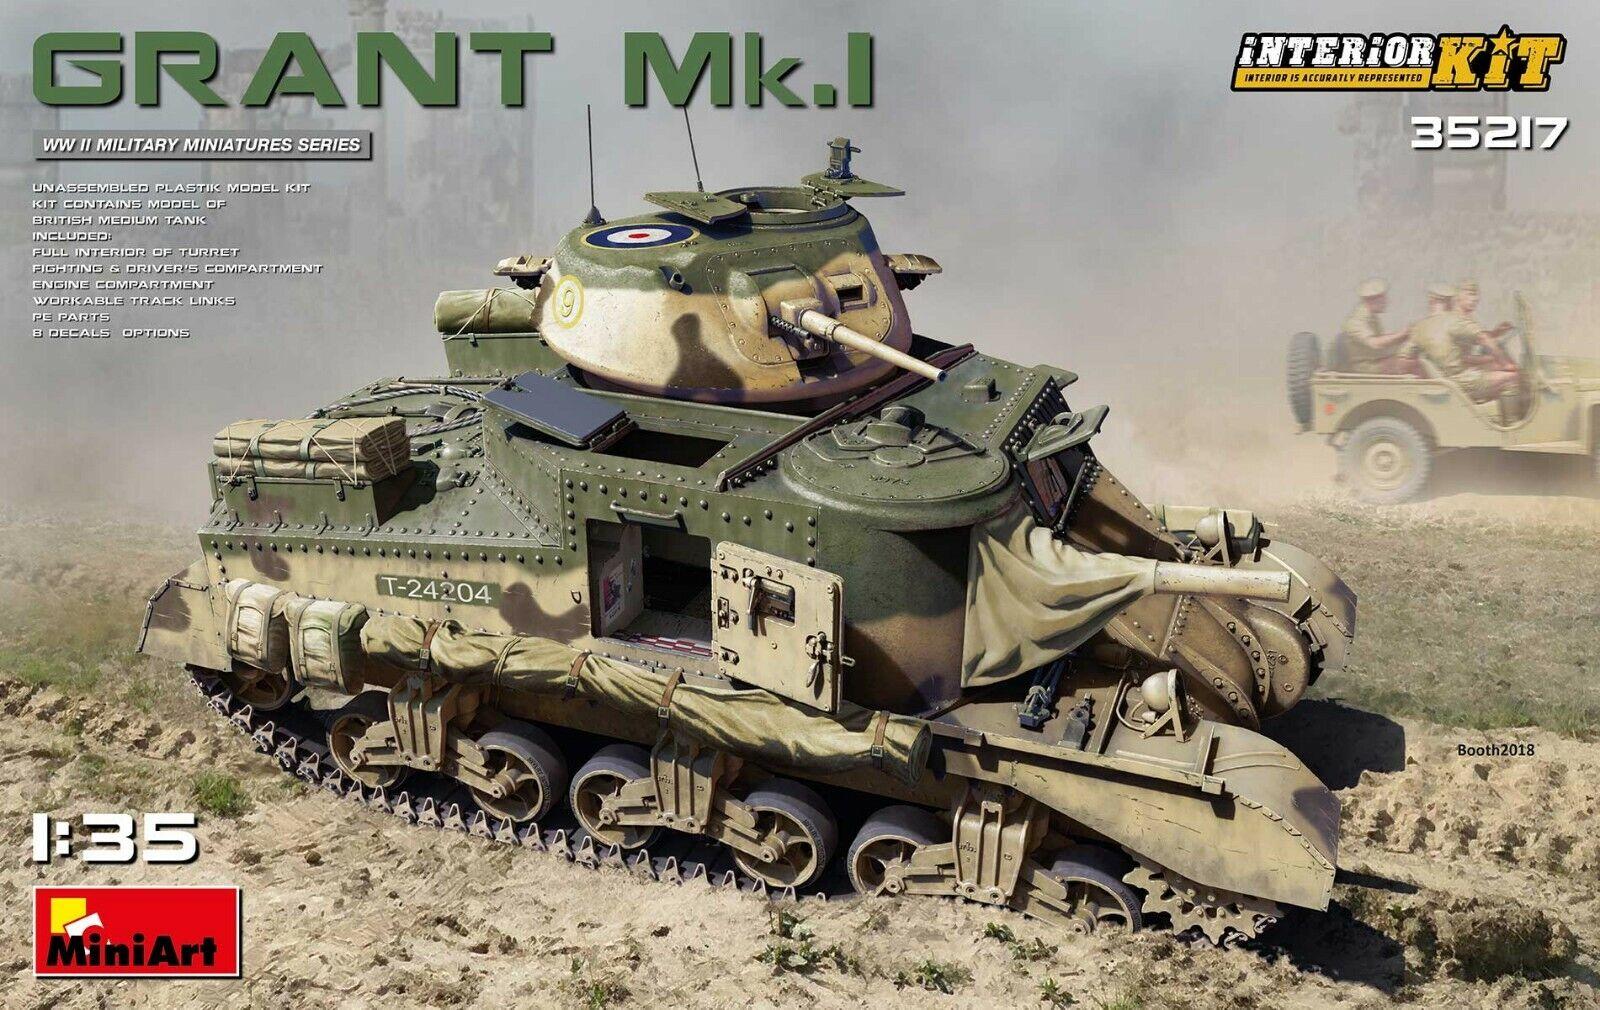 MINIART 35217 1 35 SCALE MODEL GRANT Mk.I INTERIOR KIT